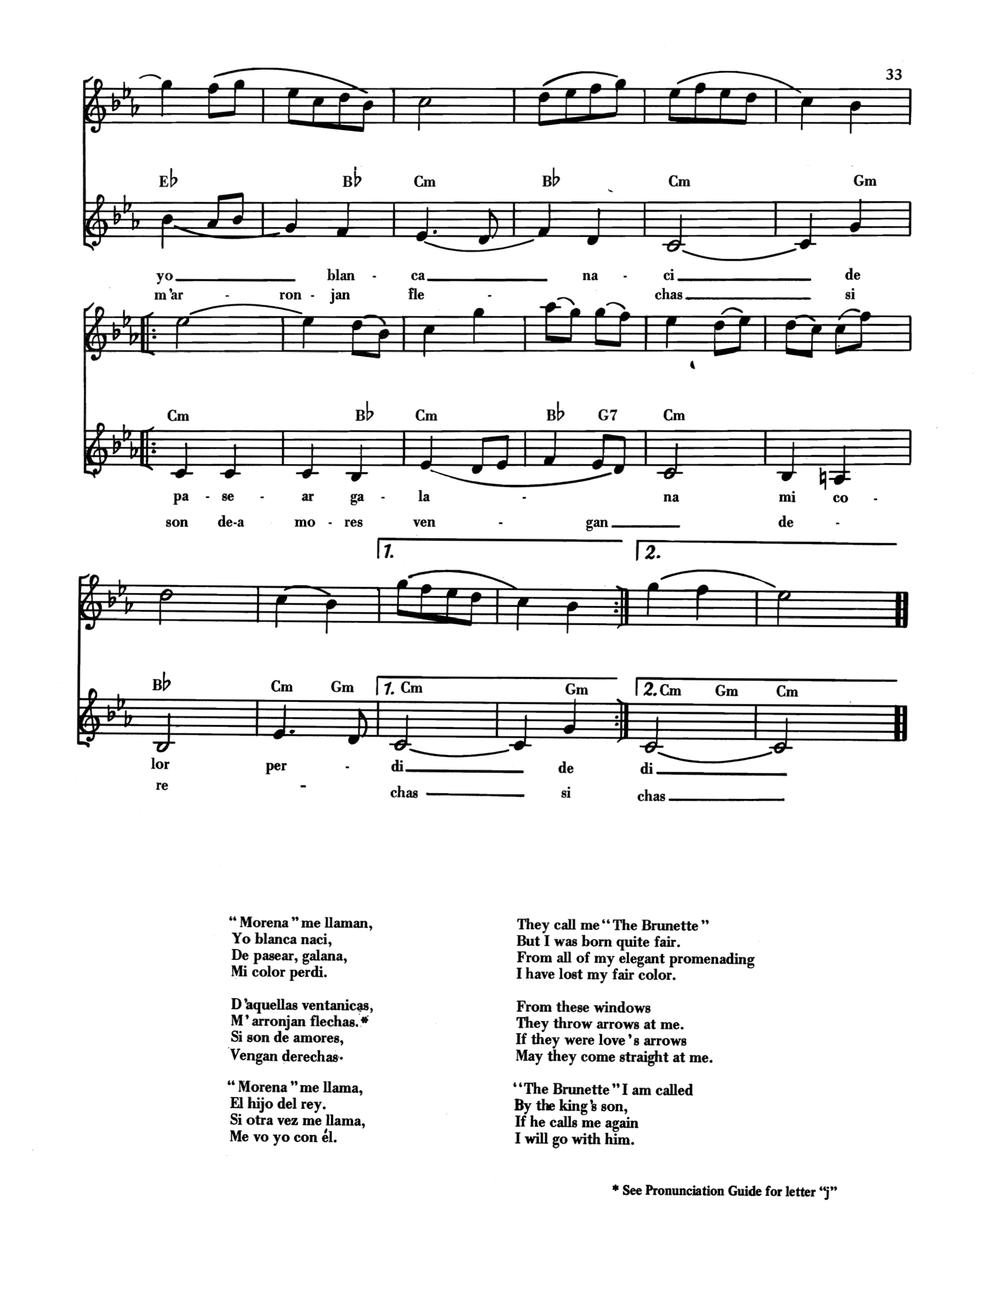 Ladino_Sephardic Music_Page_11.png